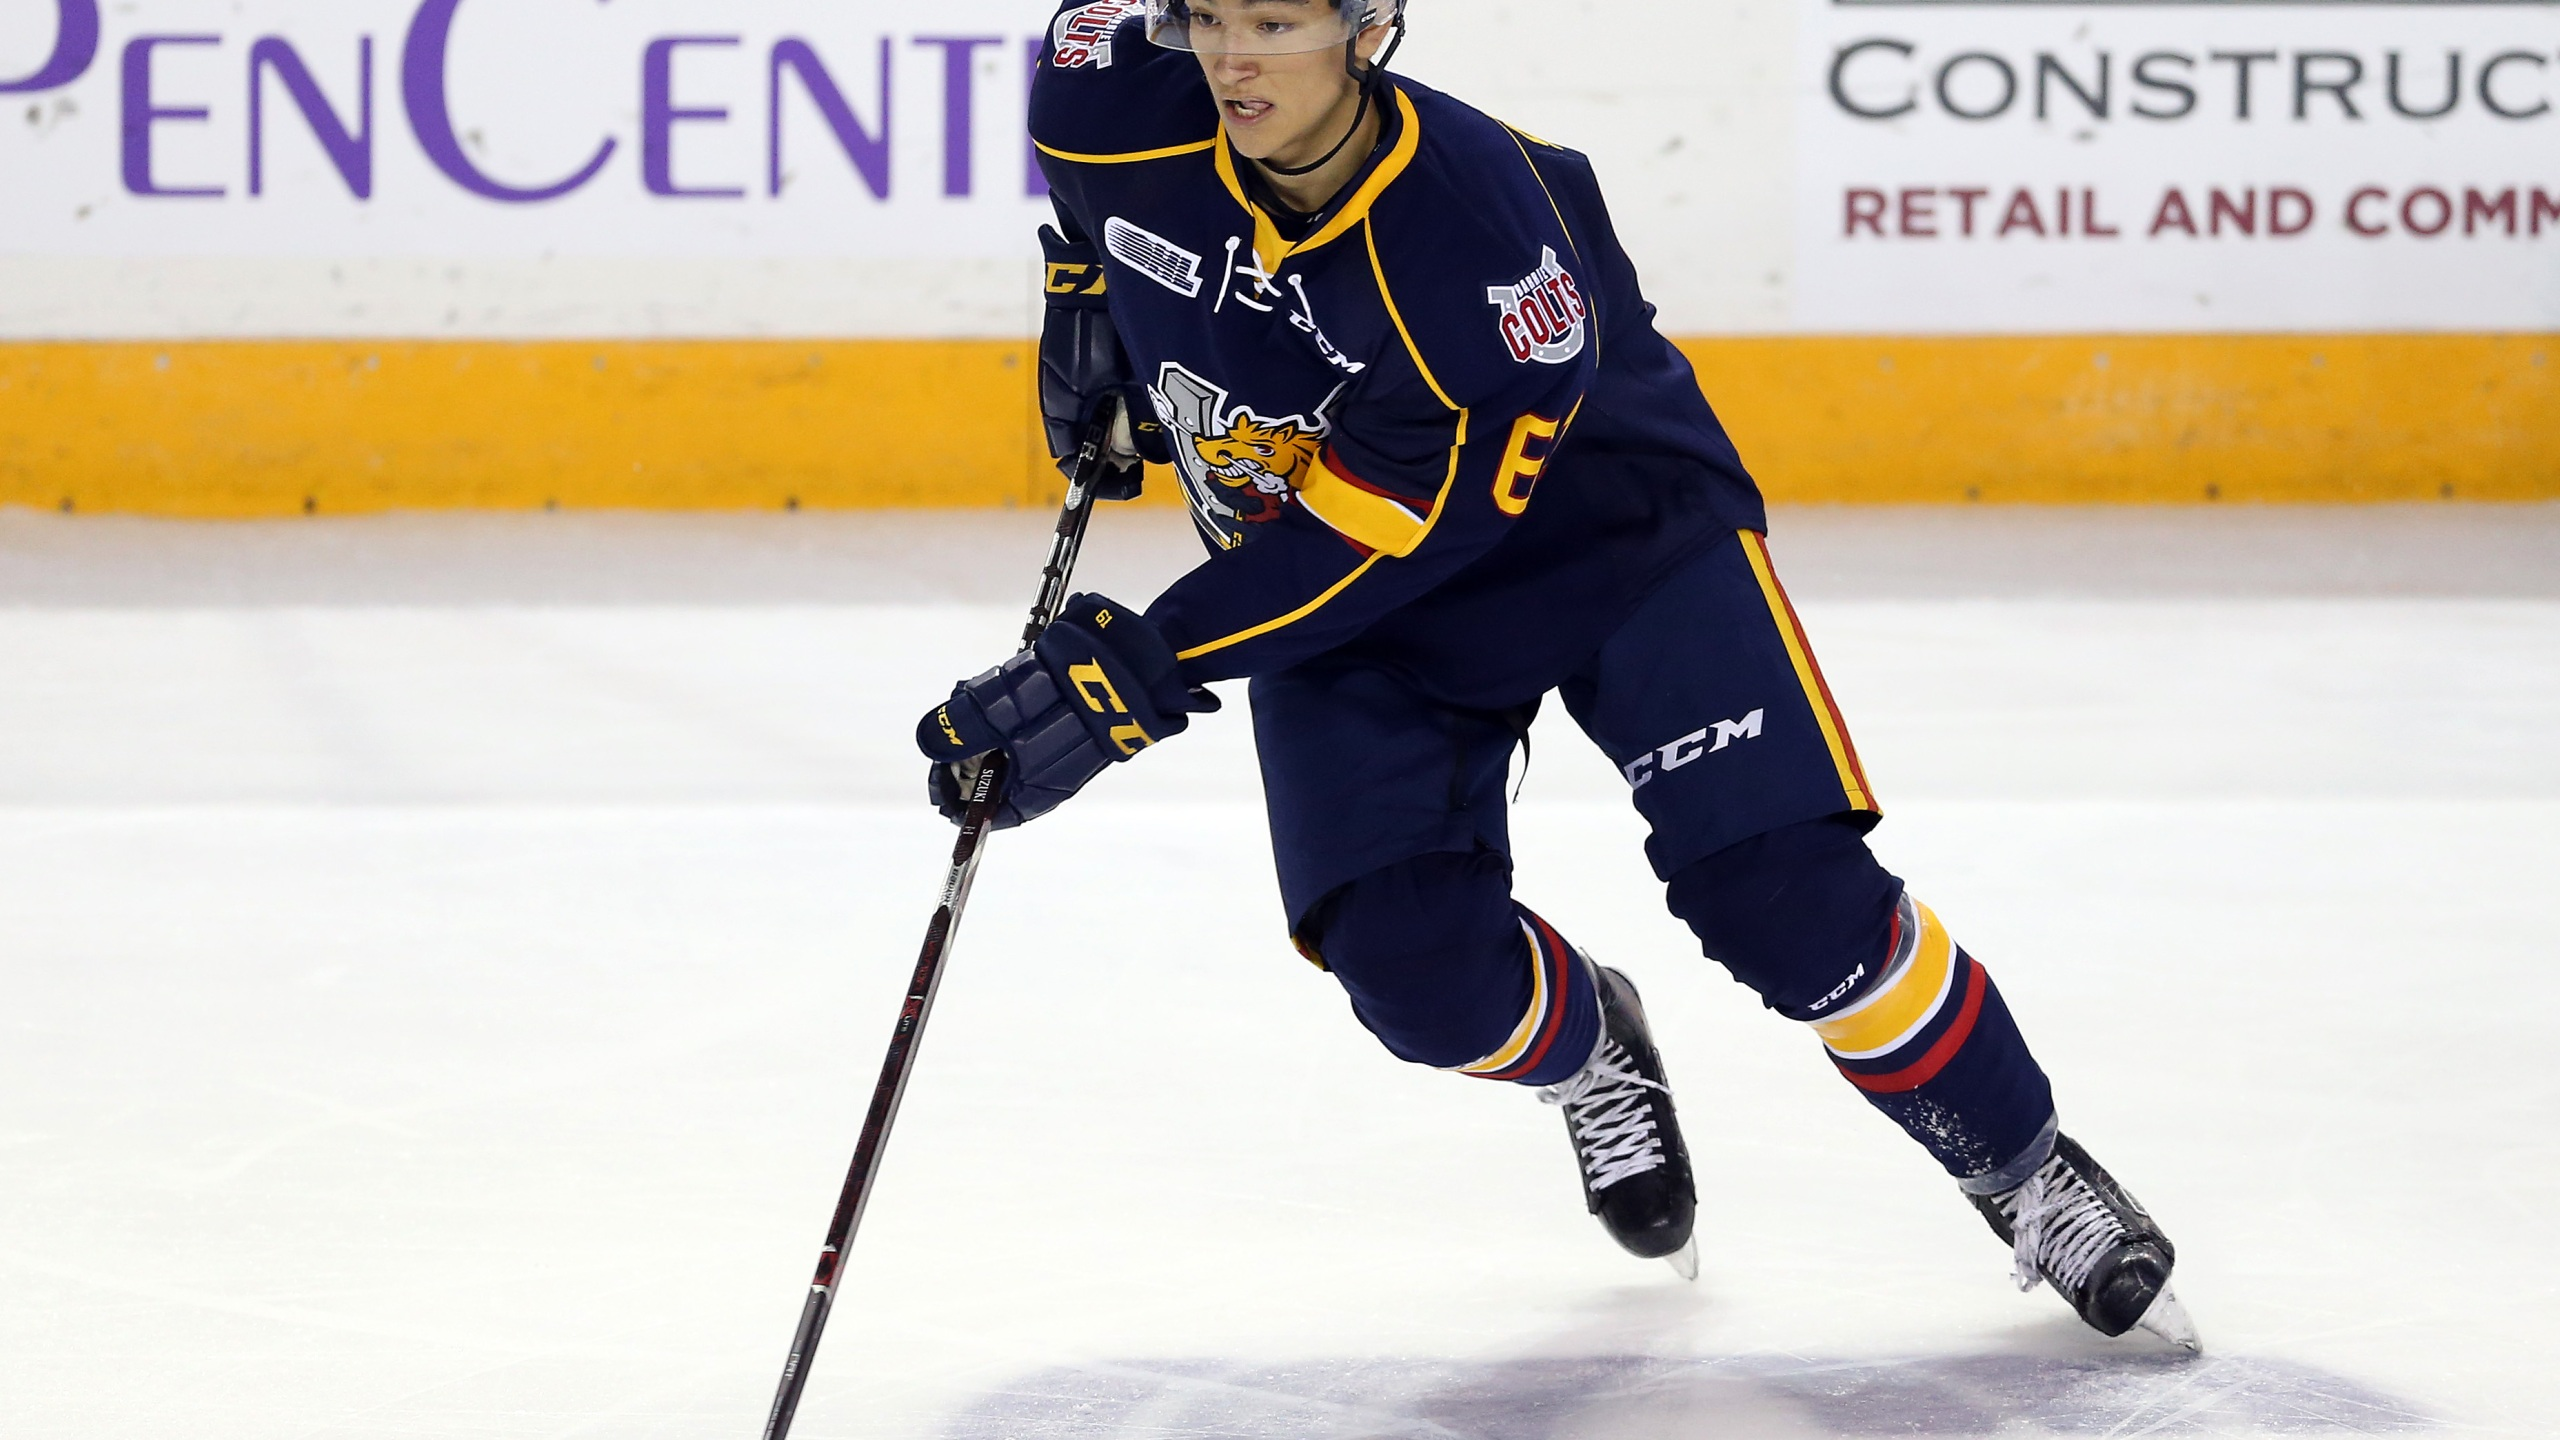 Hurricanes draft center Ryan Suzuki in 1st round of 2019 NHL draft